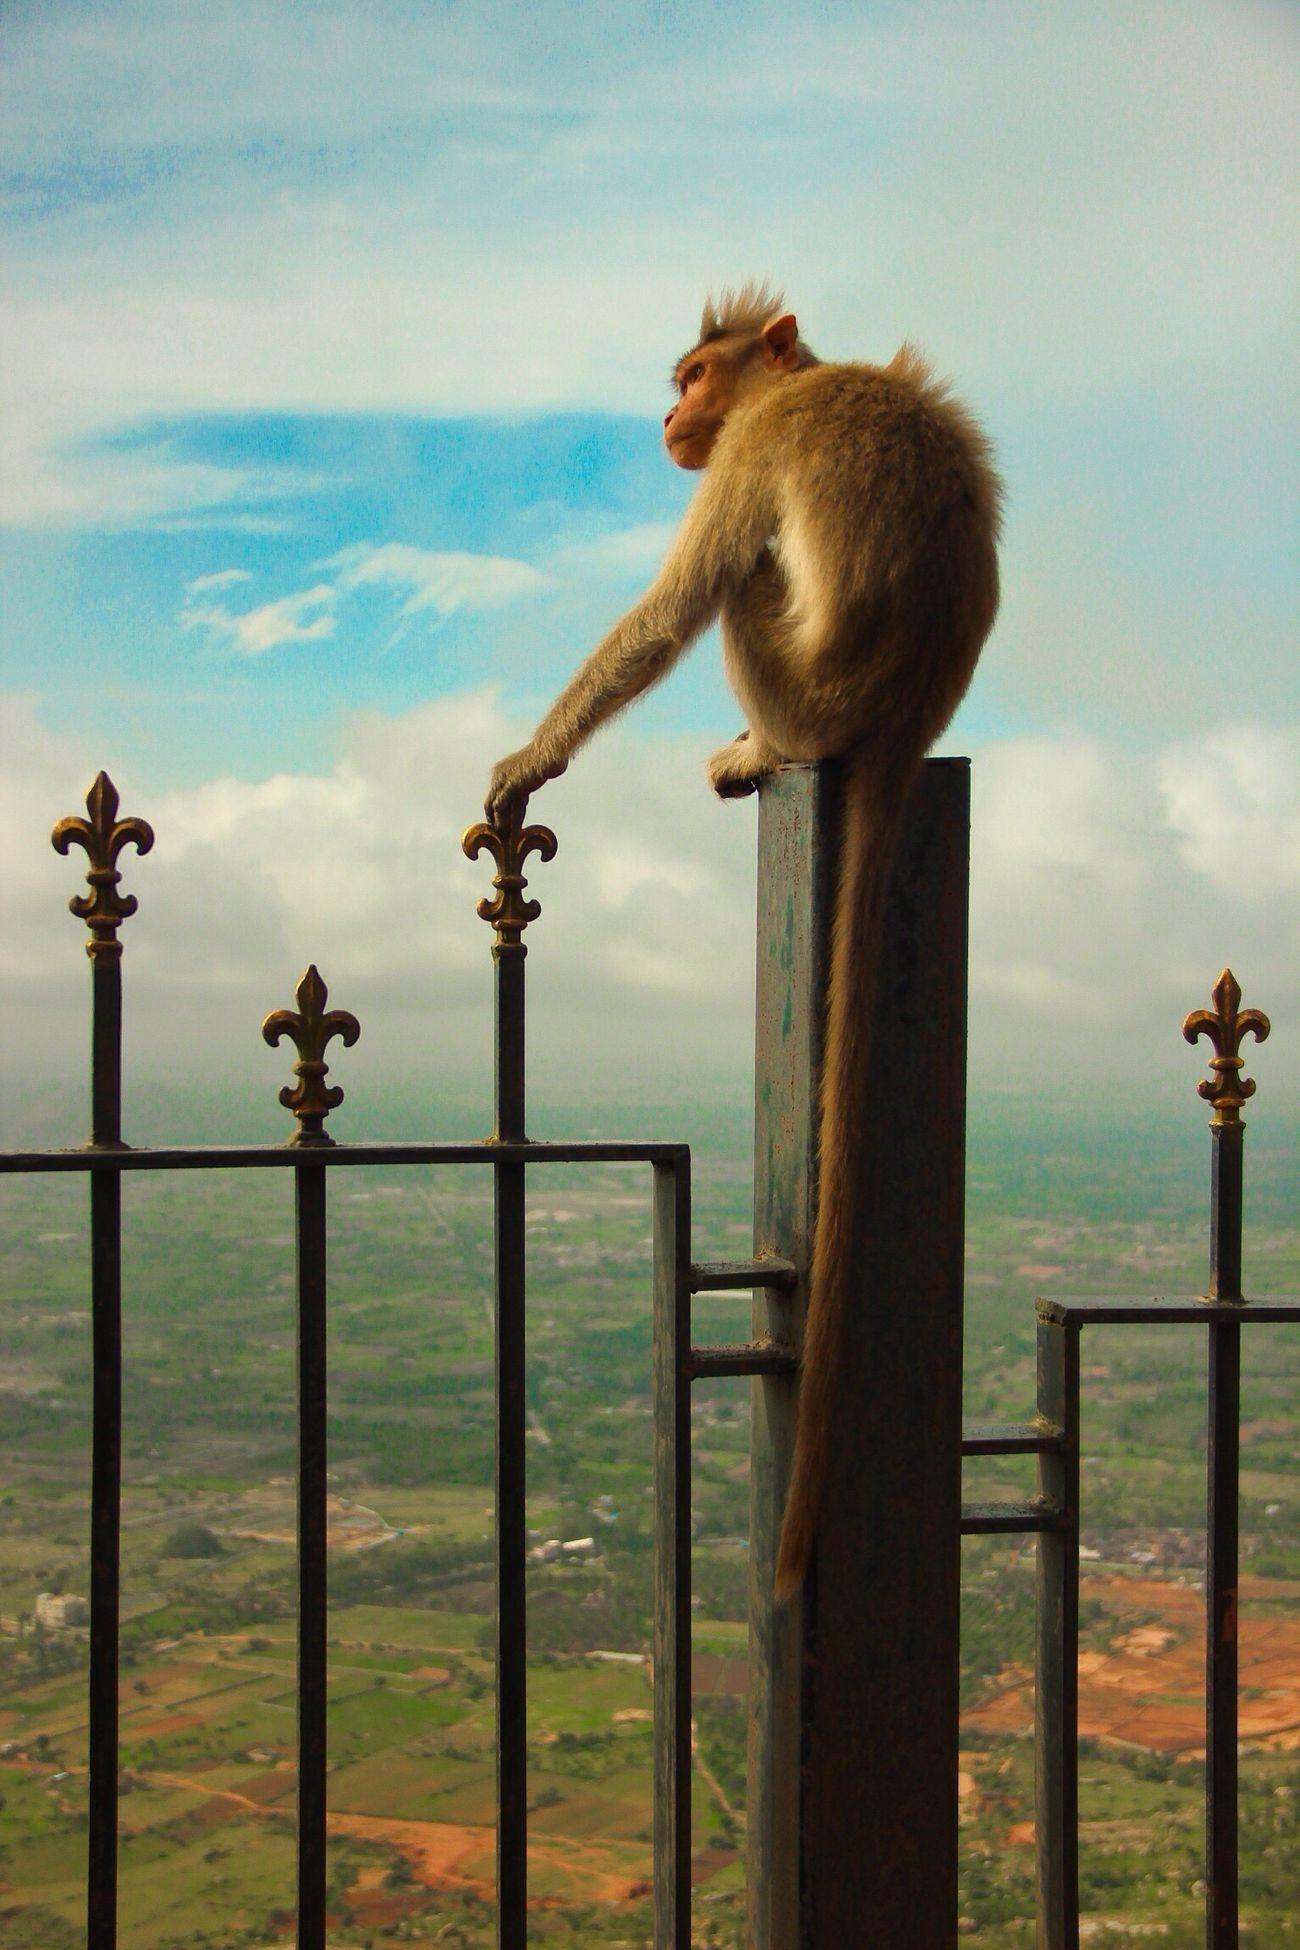 Animal Themes Monkeys Lonesurvivor King Of The World